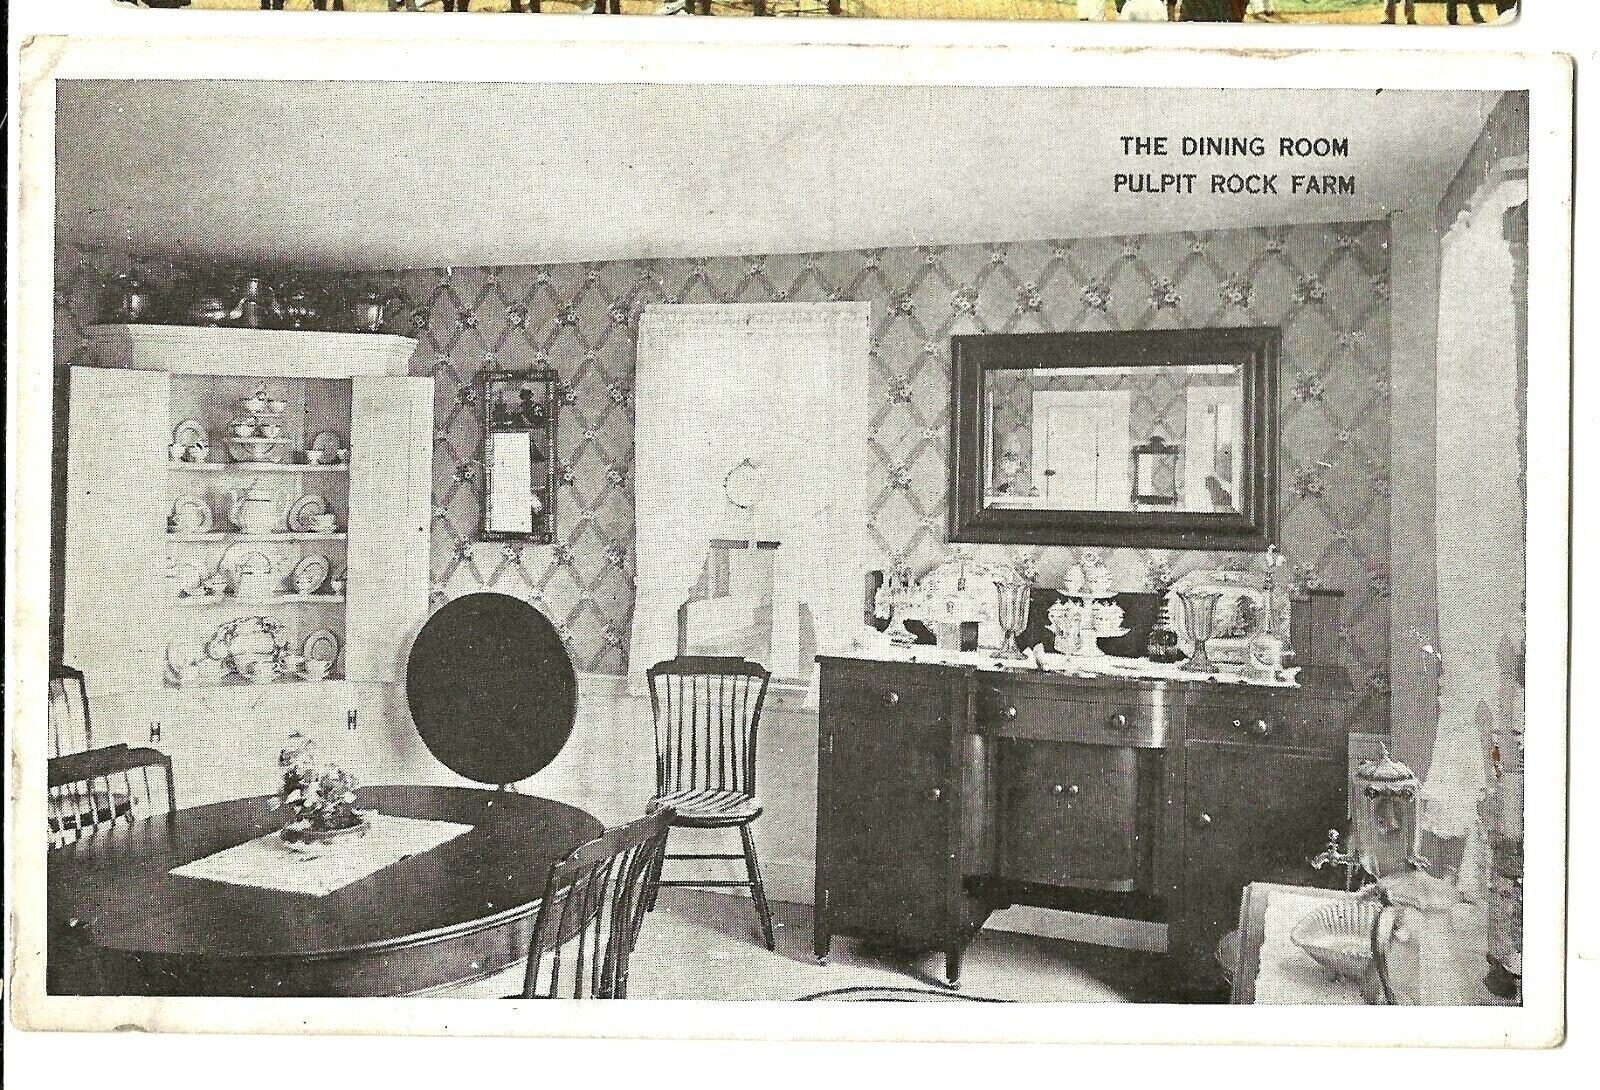 223 C1930 Postcard Dining Room At Pulpit Rock Farm Monson Ma Mass  - $6.00